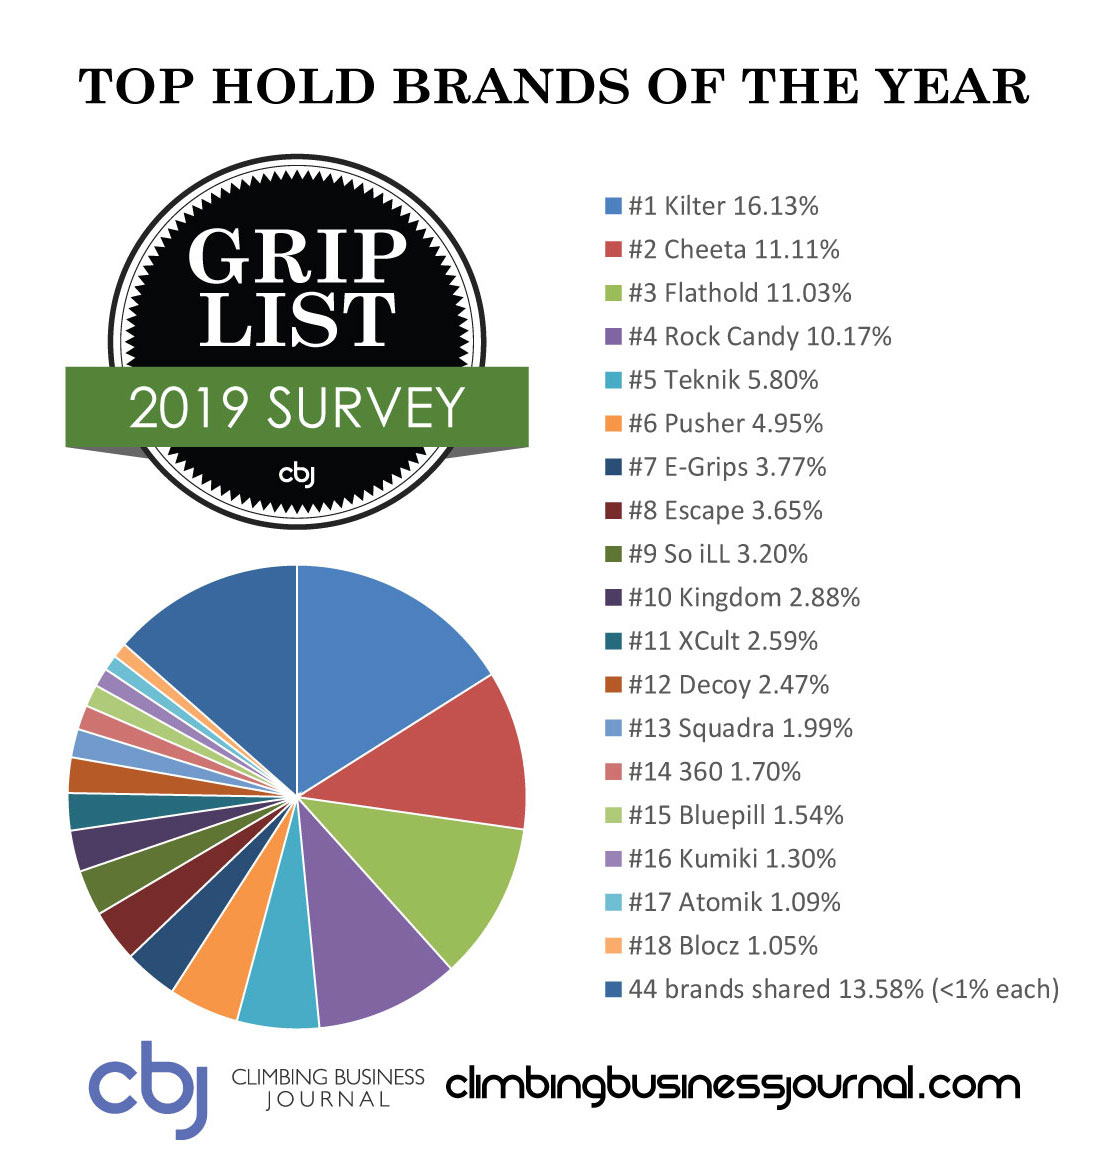 2019 Grip List top hold brands